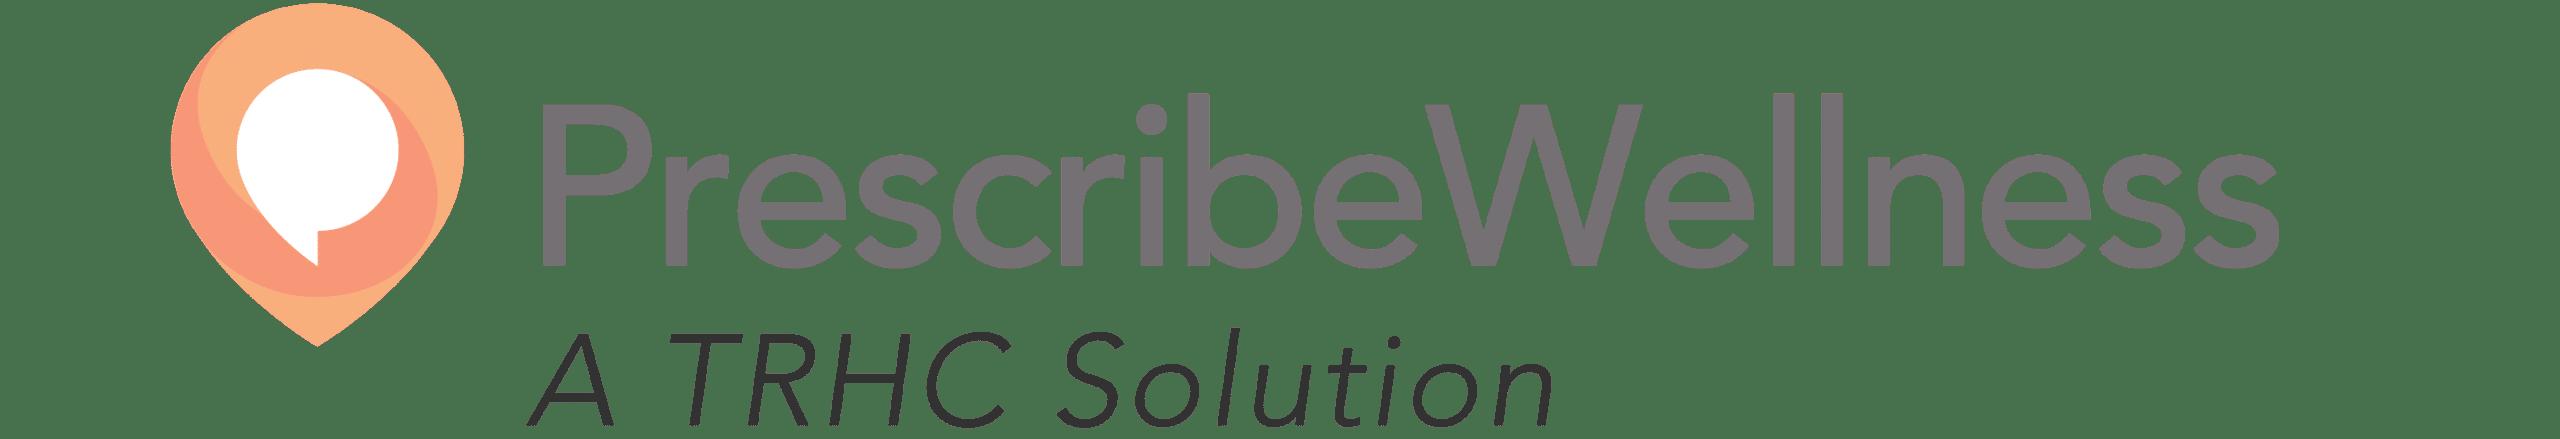 Blog   PrescribeWellness